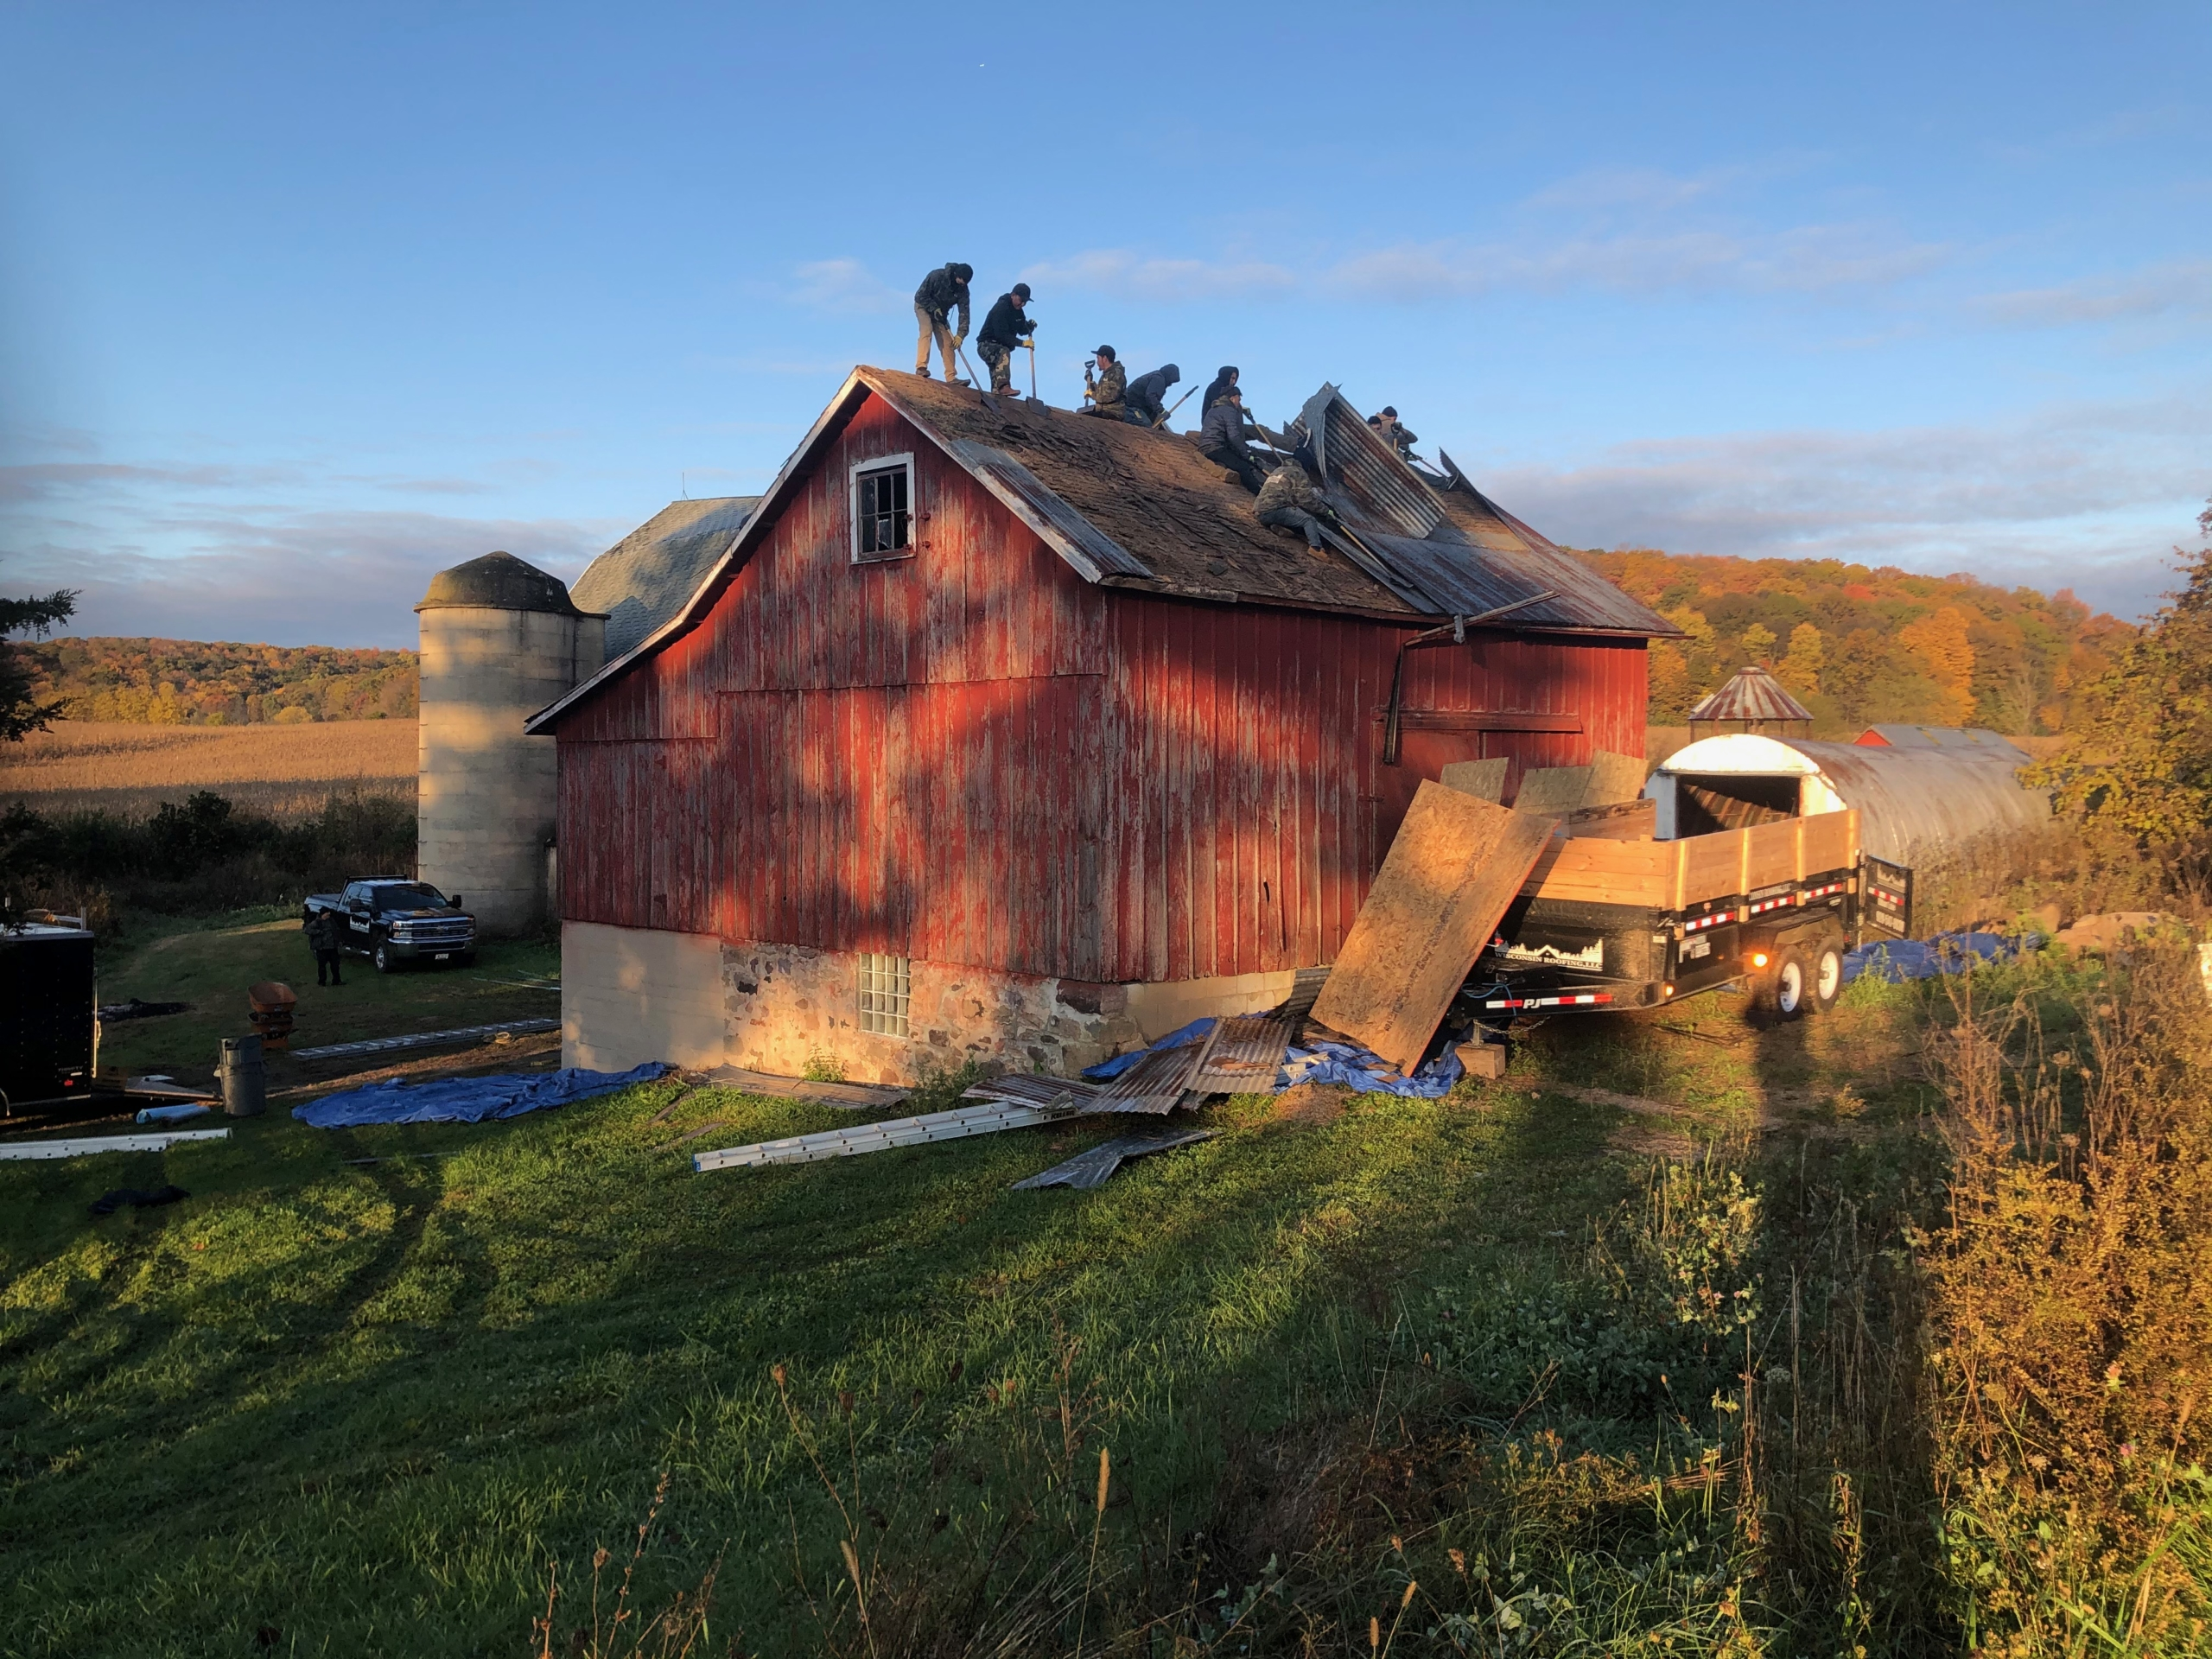 Wisconsin Roofing LLC | Residential | Kohler | Metal standing seam roof | Tear off